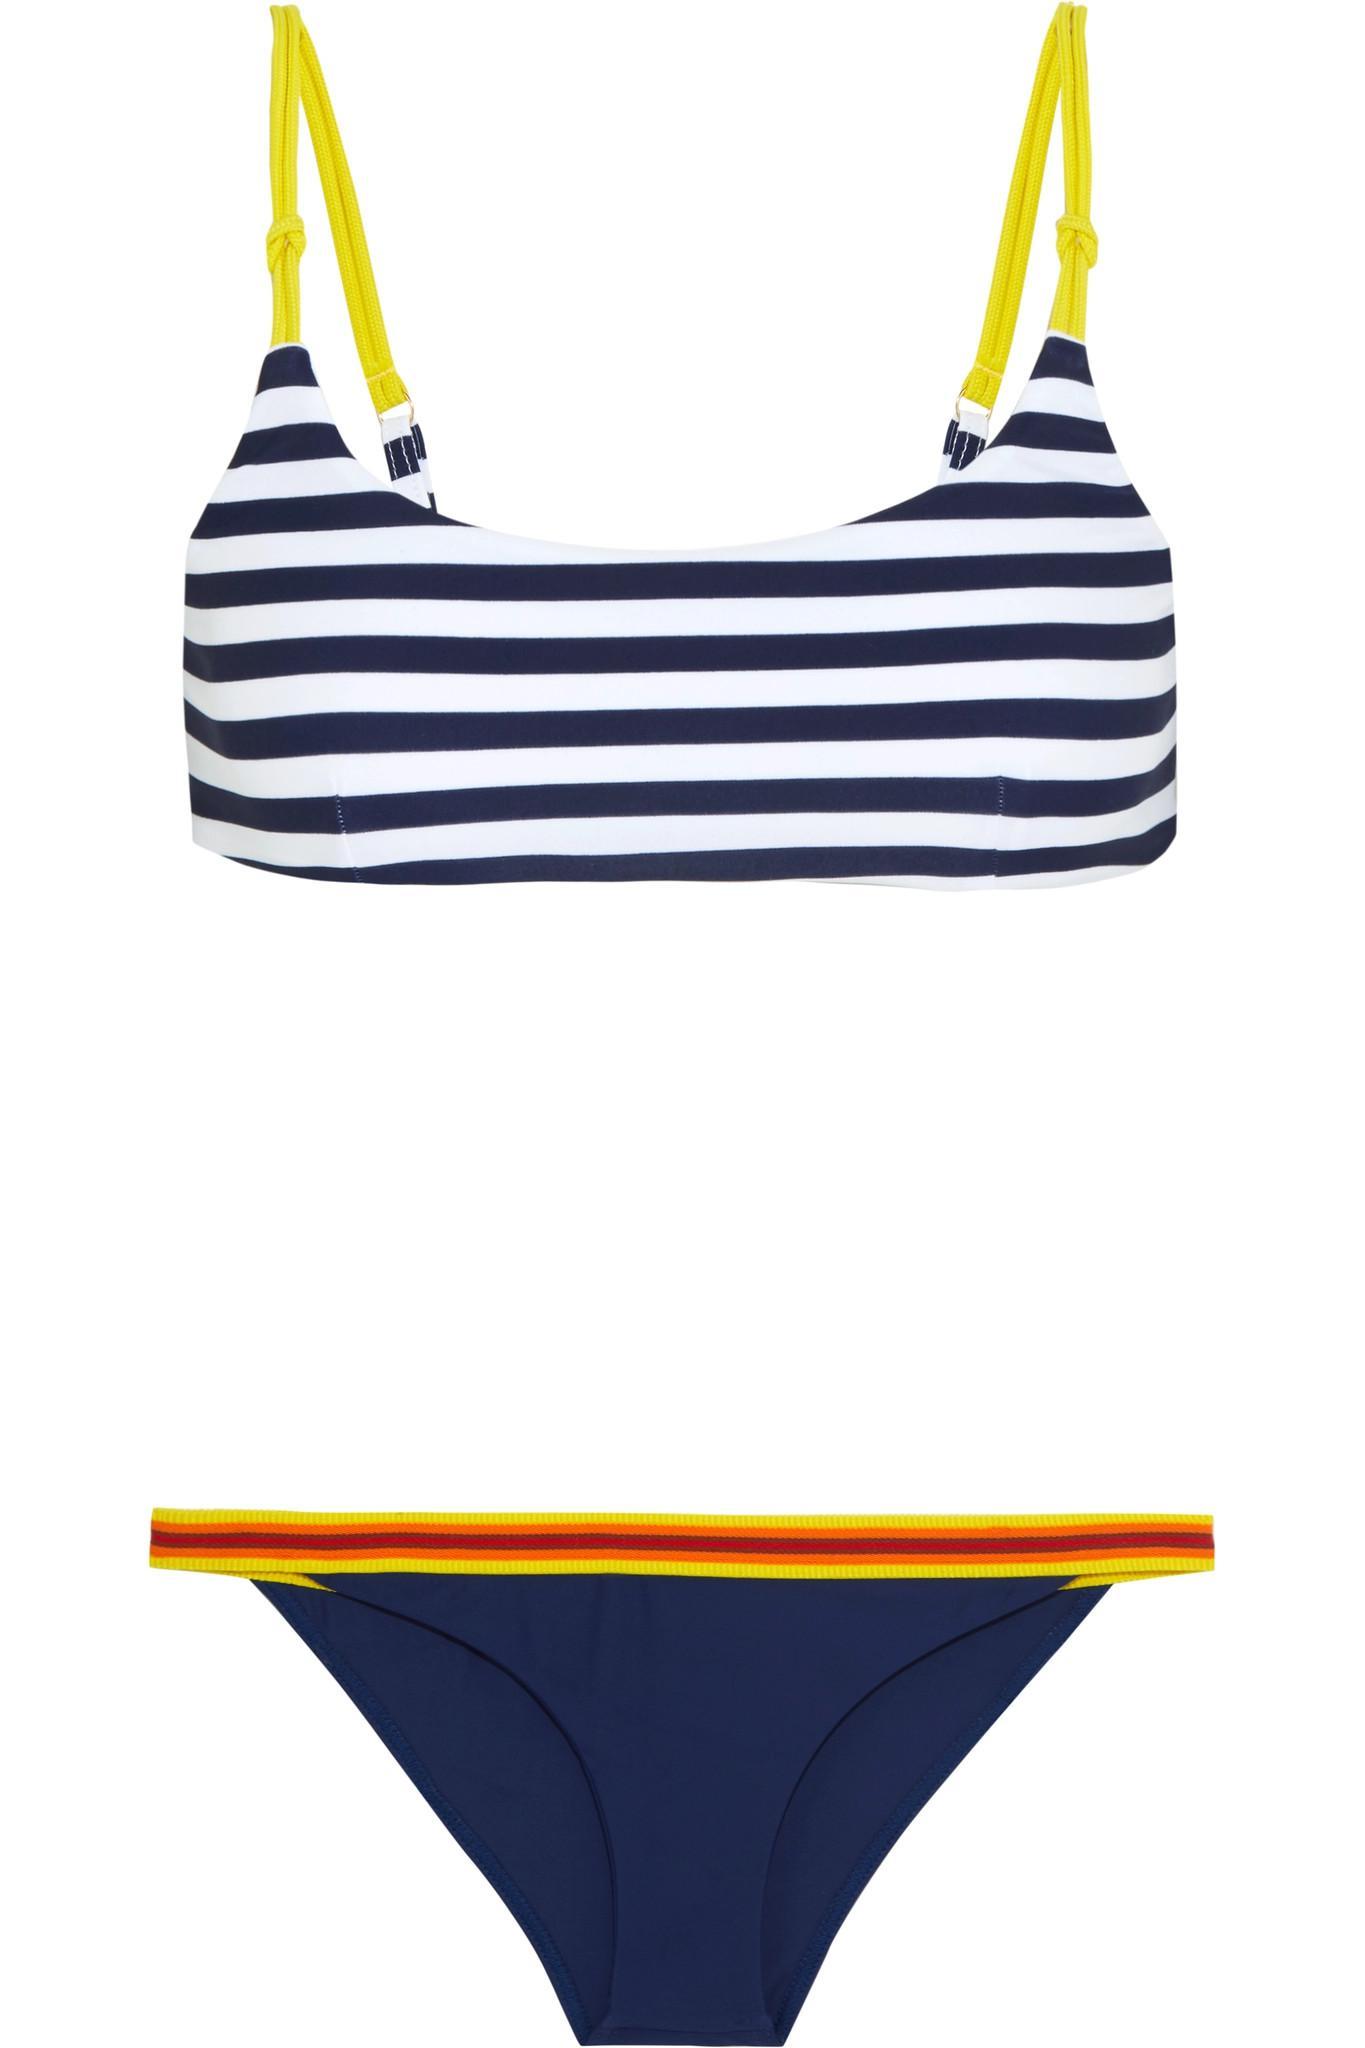 4b9d7bae0f Lyst - RYE SWIM Splish Striped Canvas And Grosgrain-trimmed Bikini ...